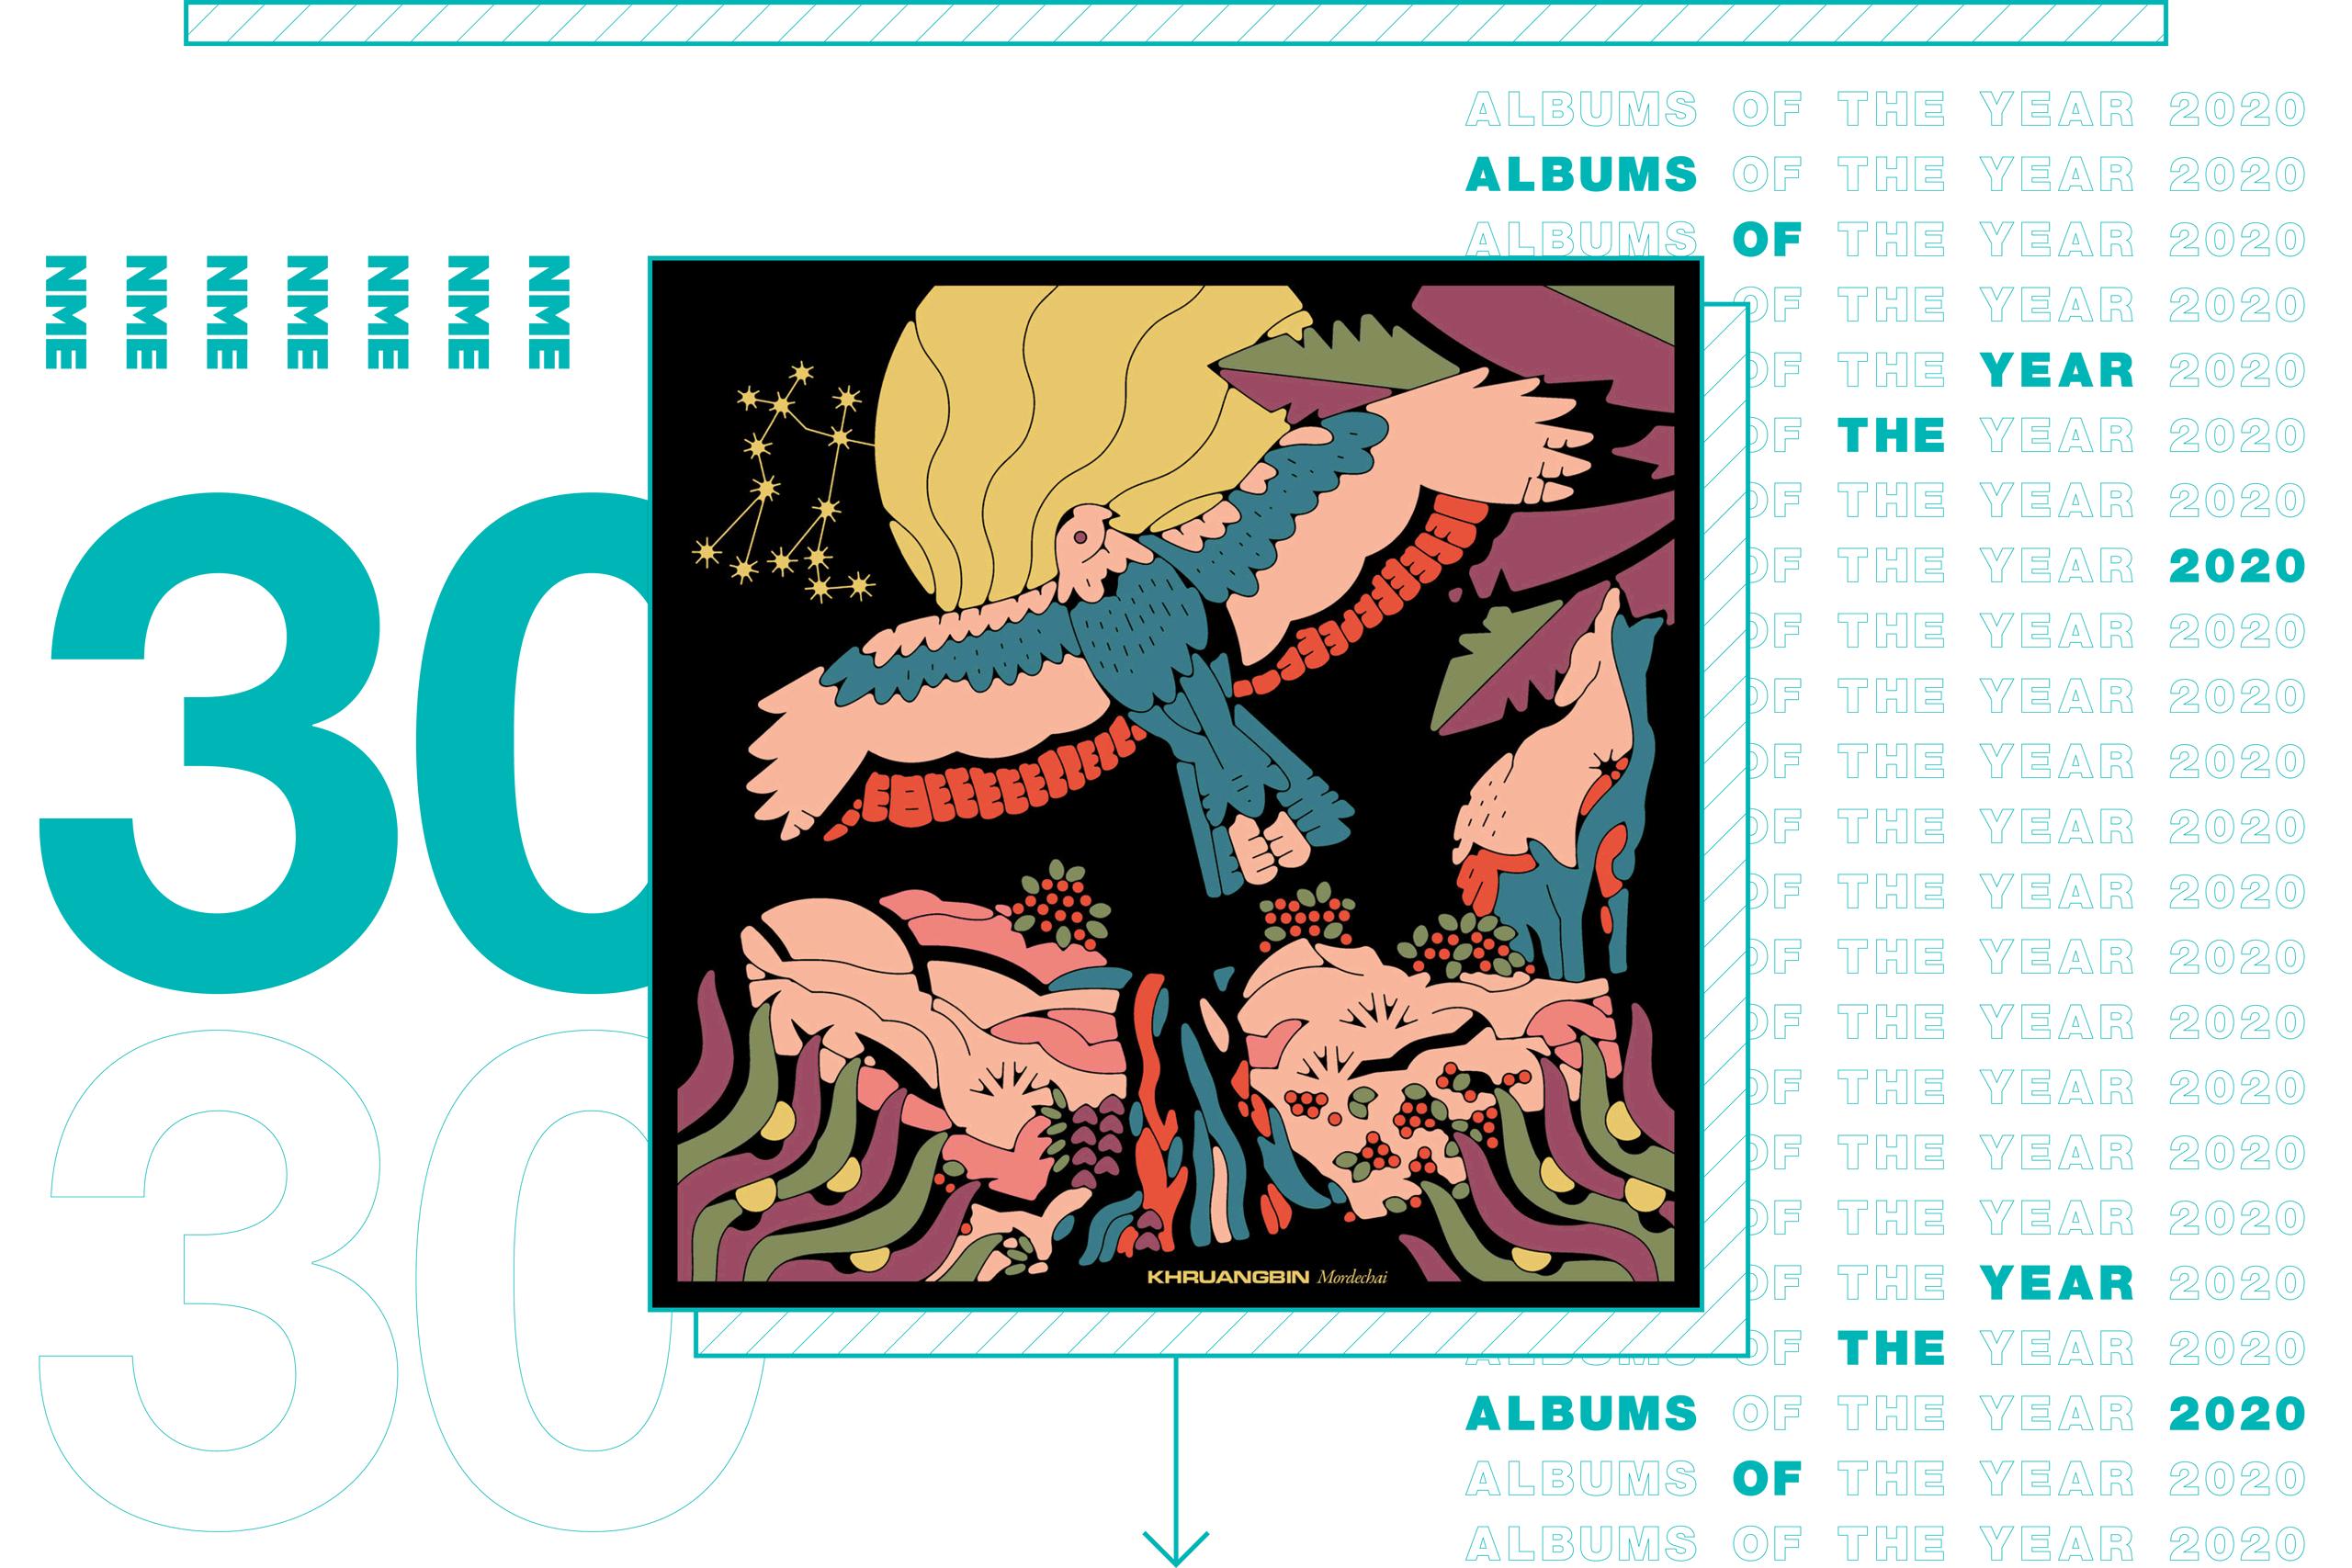 NME Album Of The Year 2020 Khruangbin, 'Mordechai'